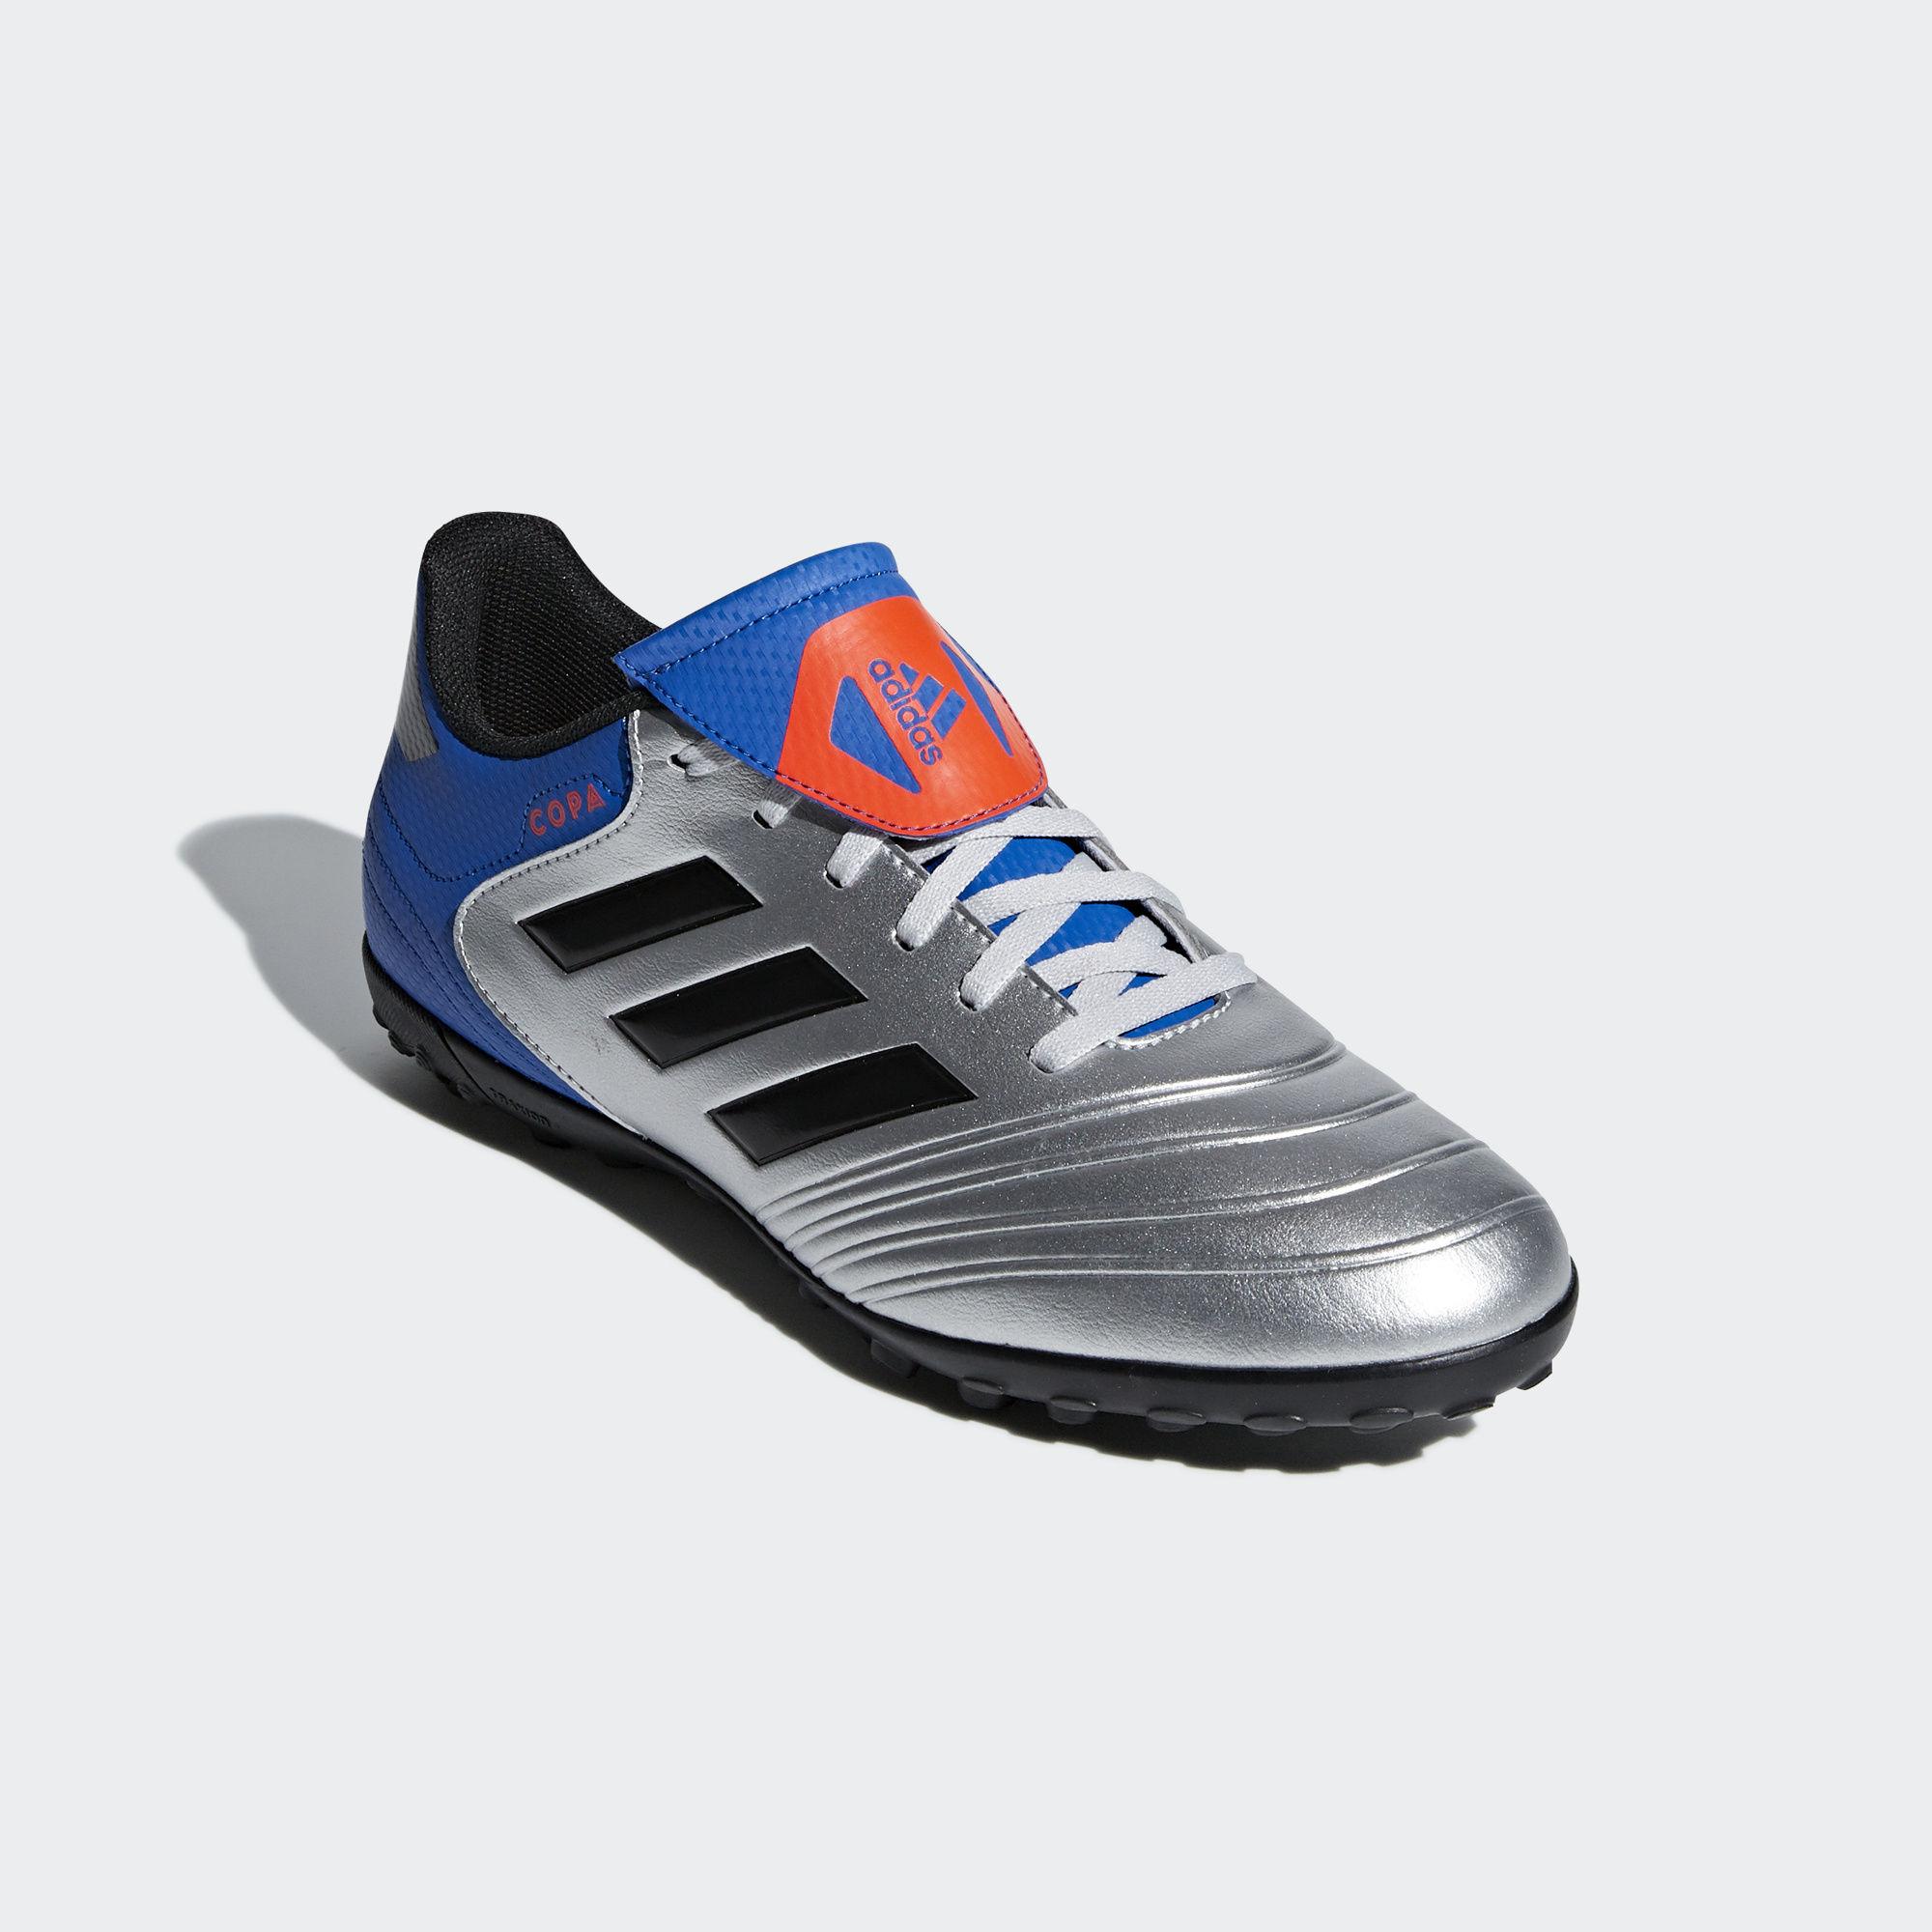 Football-shoes-Adidas-Scarpe-Calcio-Copa-Tango-18-4-Silver-Calcetto-Turf-2018 miniatura 8